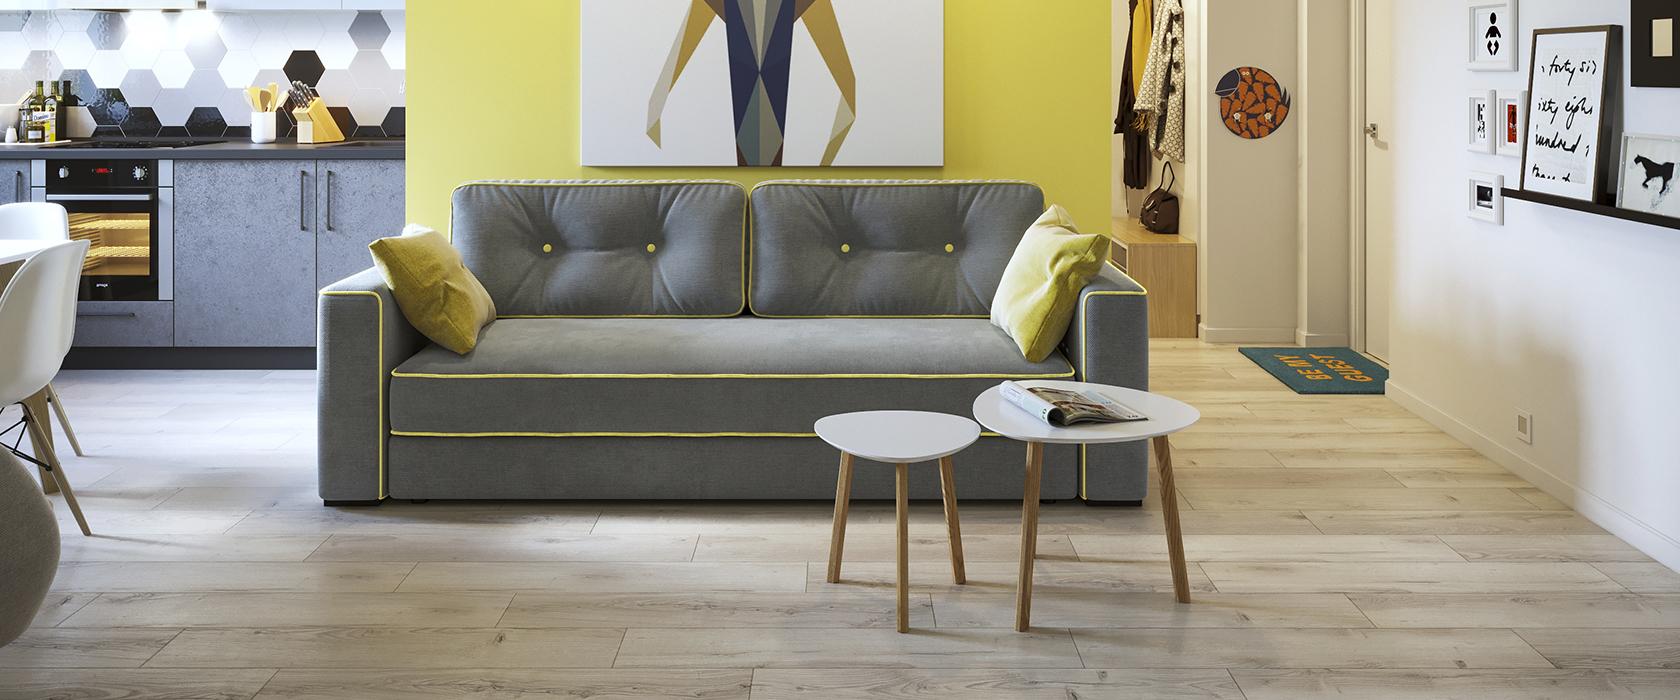 Трехместный диван Silvio - Фото 2 - Pufetto